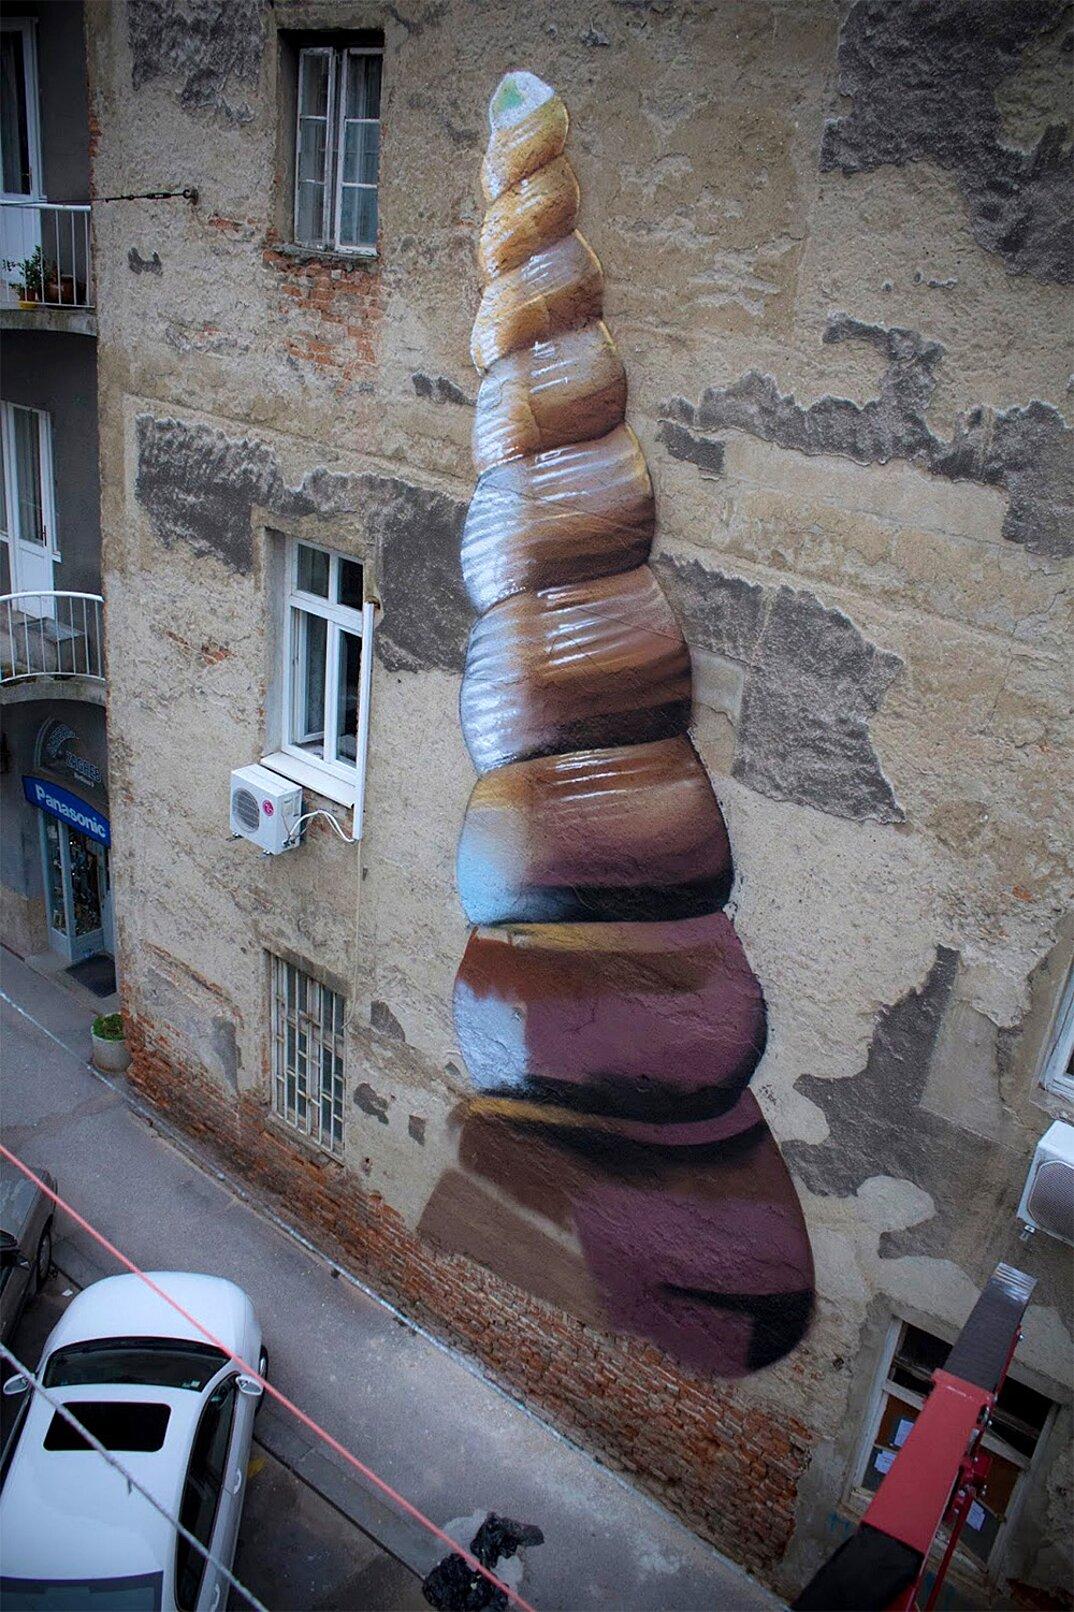 street-art-lumache-zagabria-croazia-lonac-rendezvous-festival-2